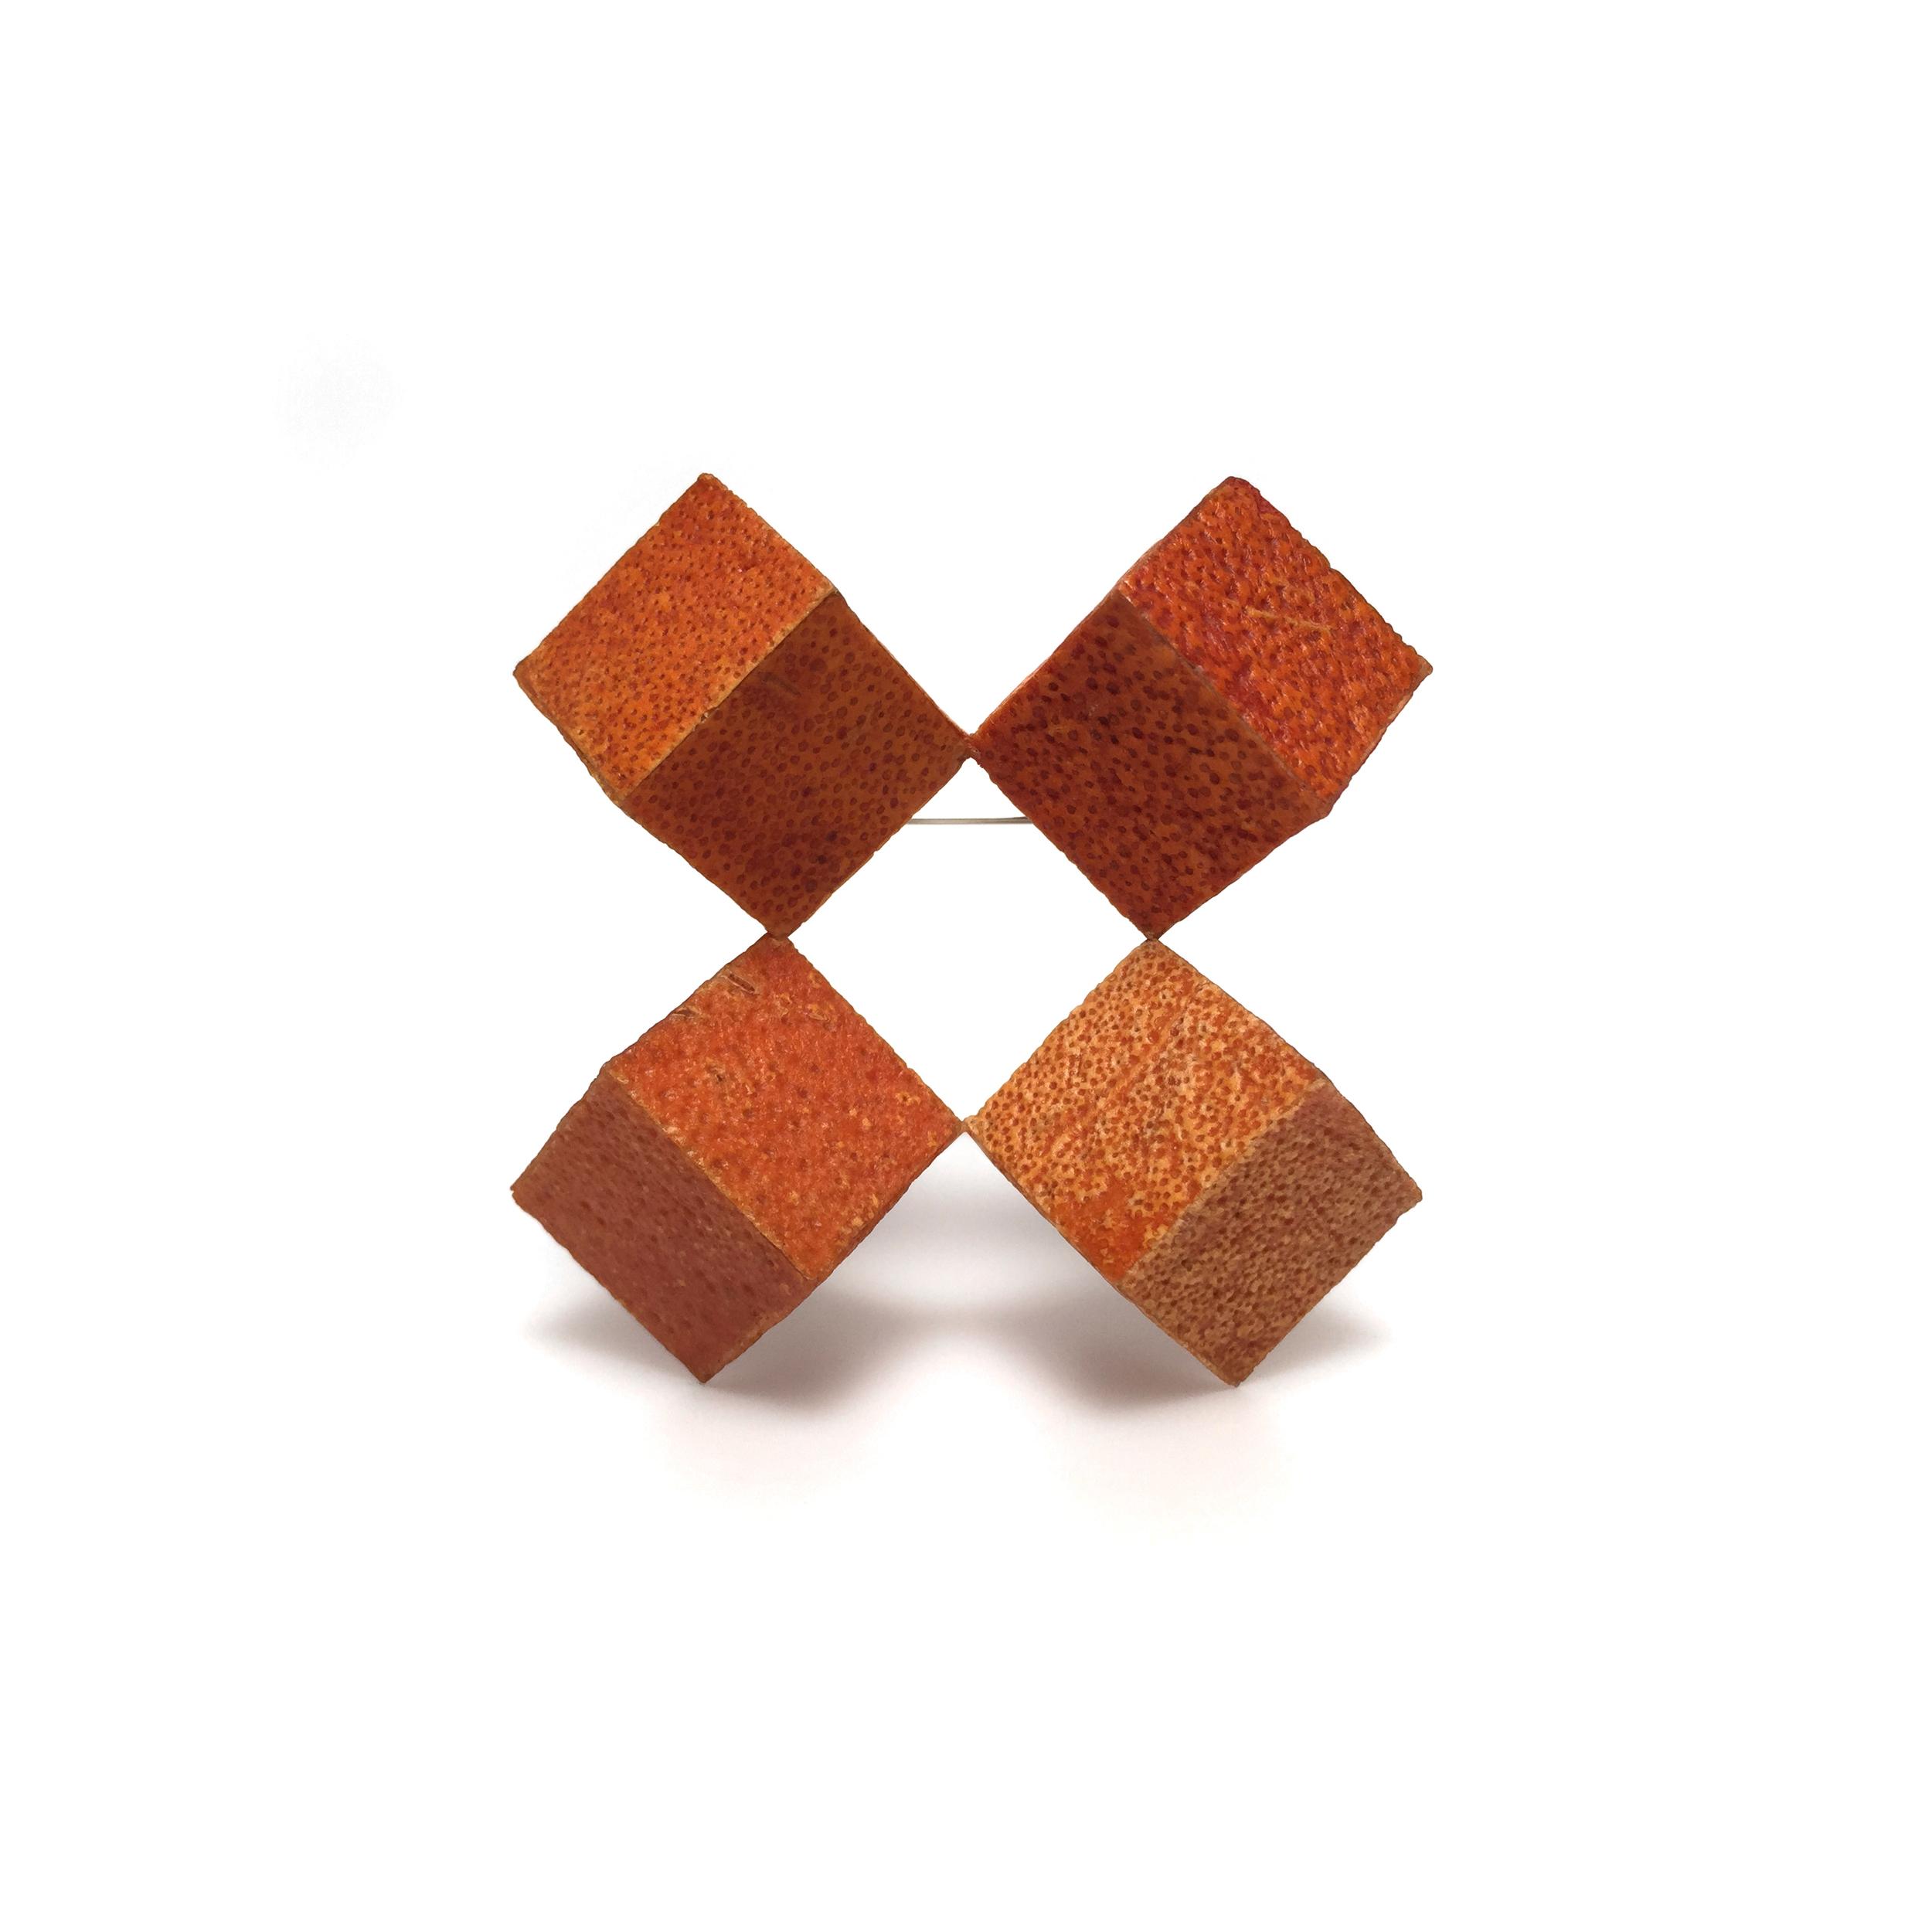 "Cubic Tangelo Brooch III , 2015. Tangelo peel, plywood, steel. 2.5"" x 2.5"" x 1.25"""